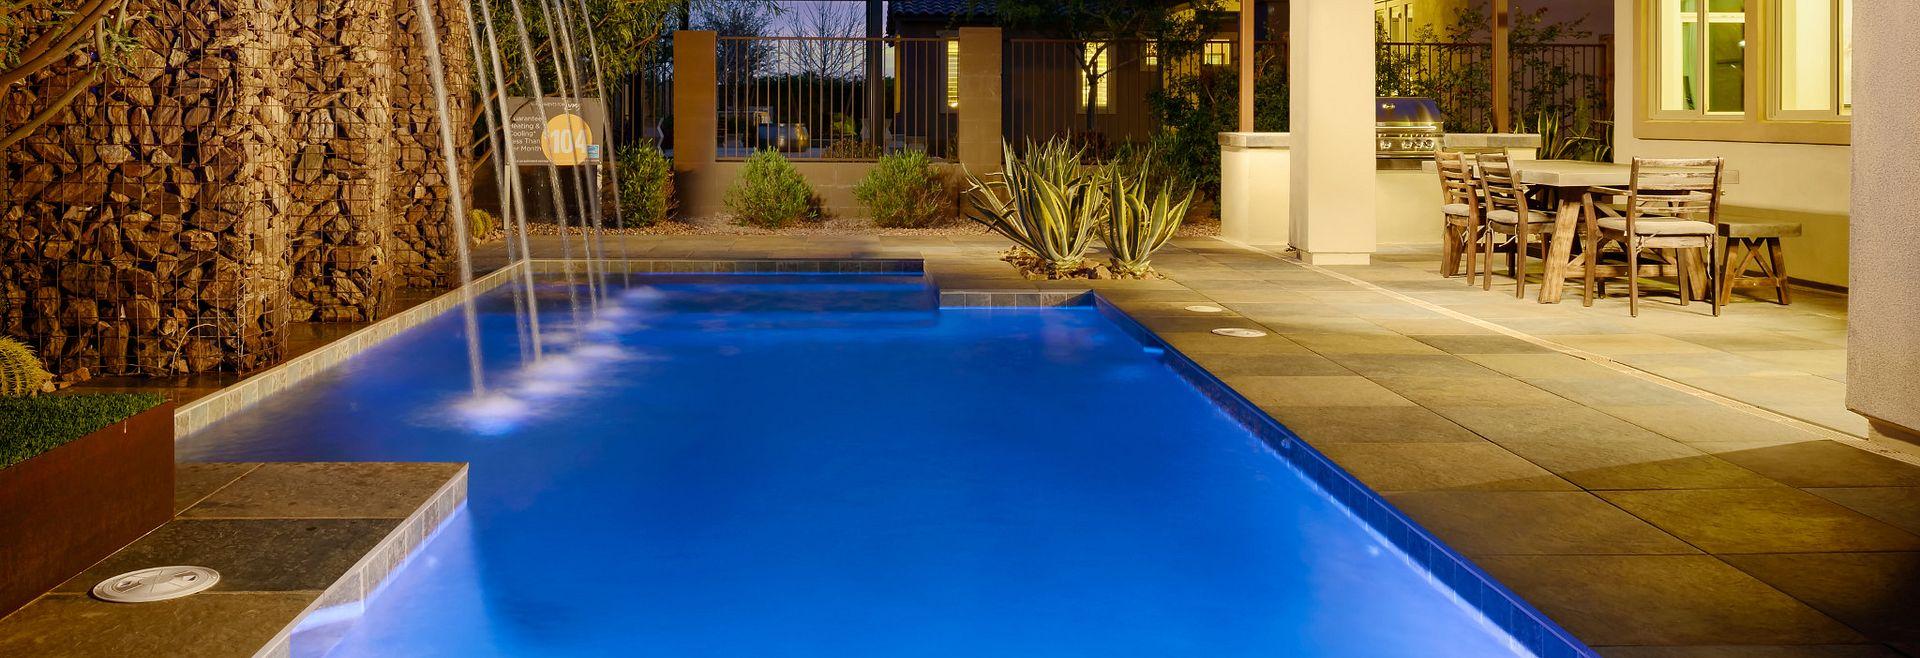 Ambition at Eastmark Backyard Pool